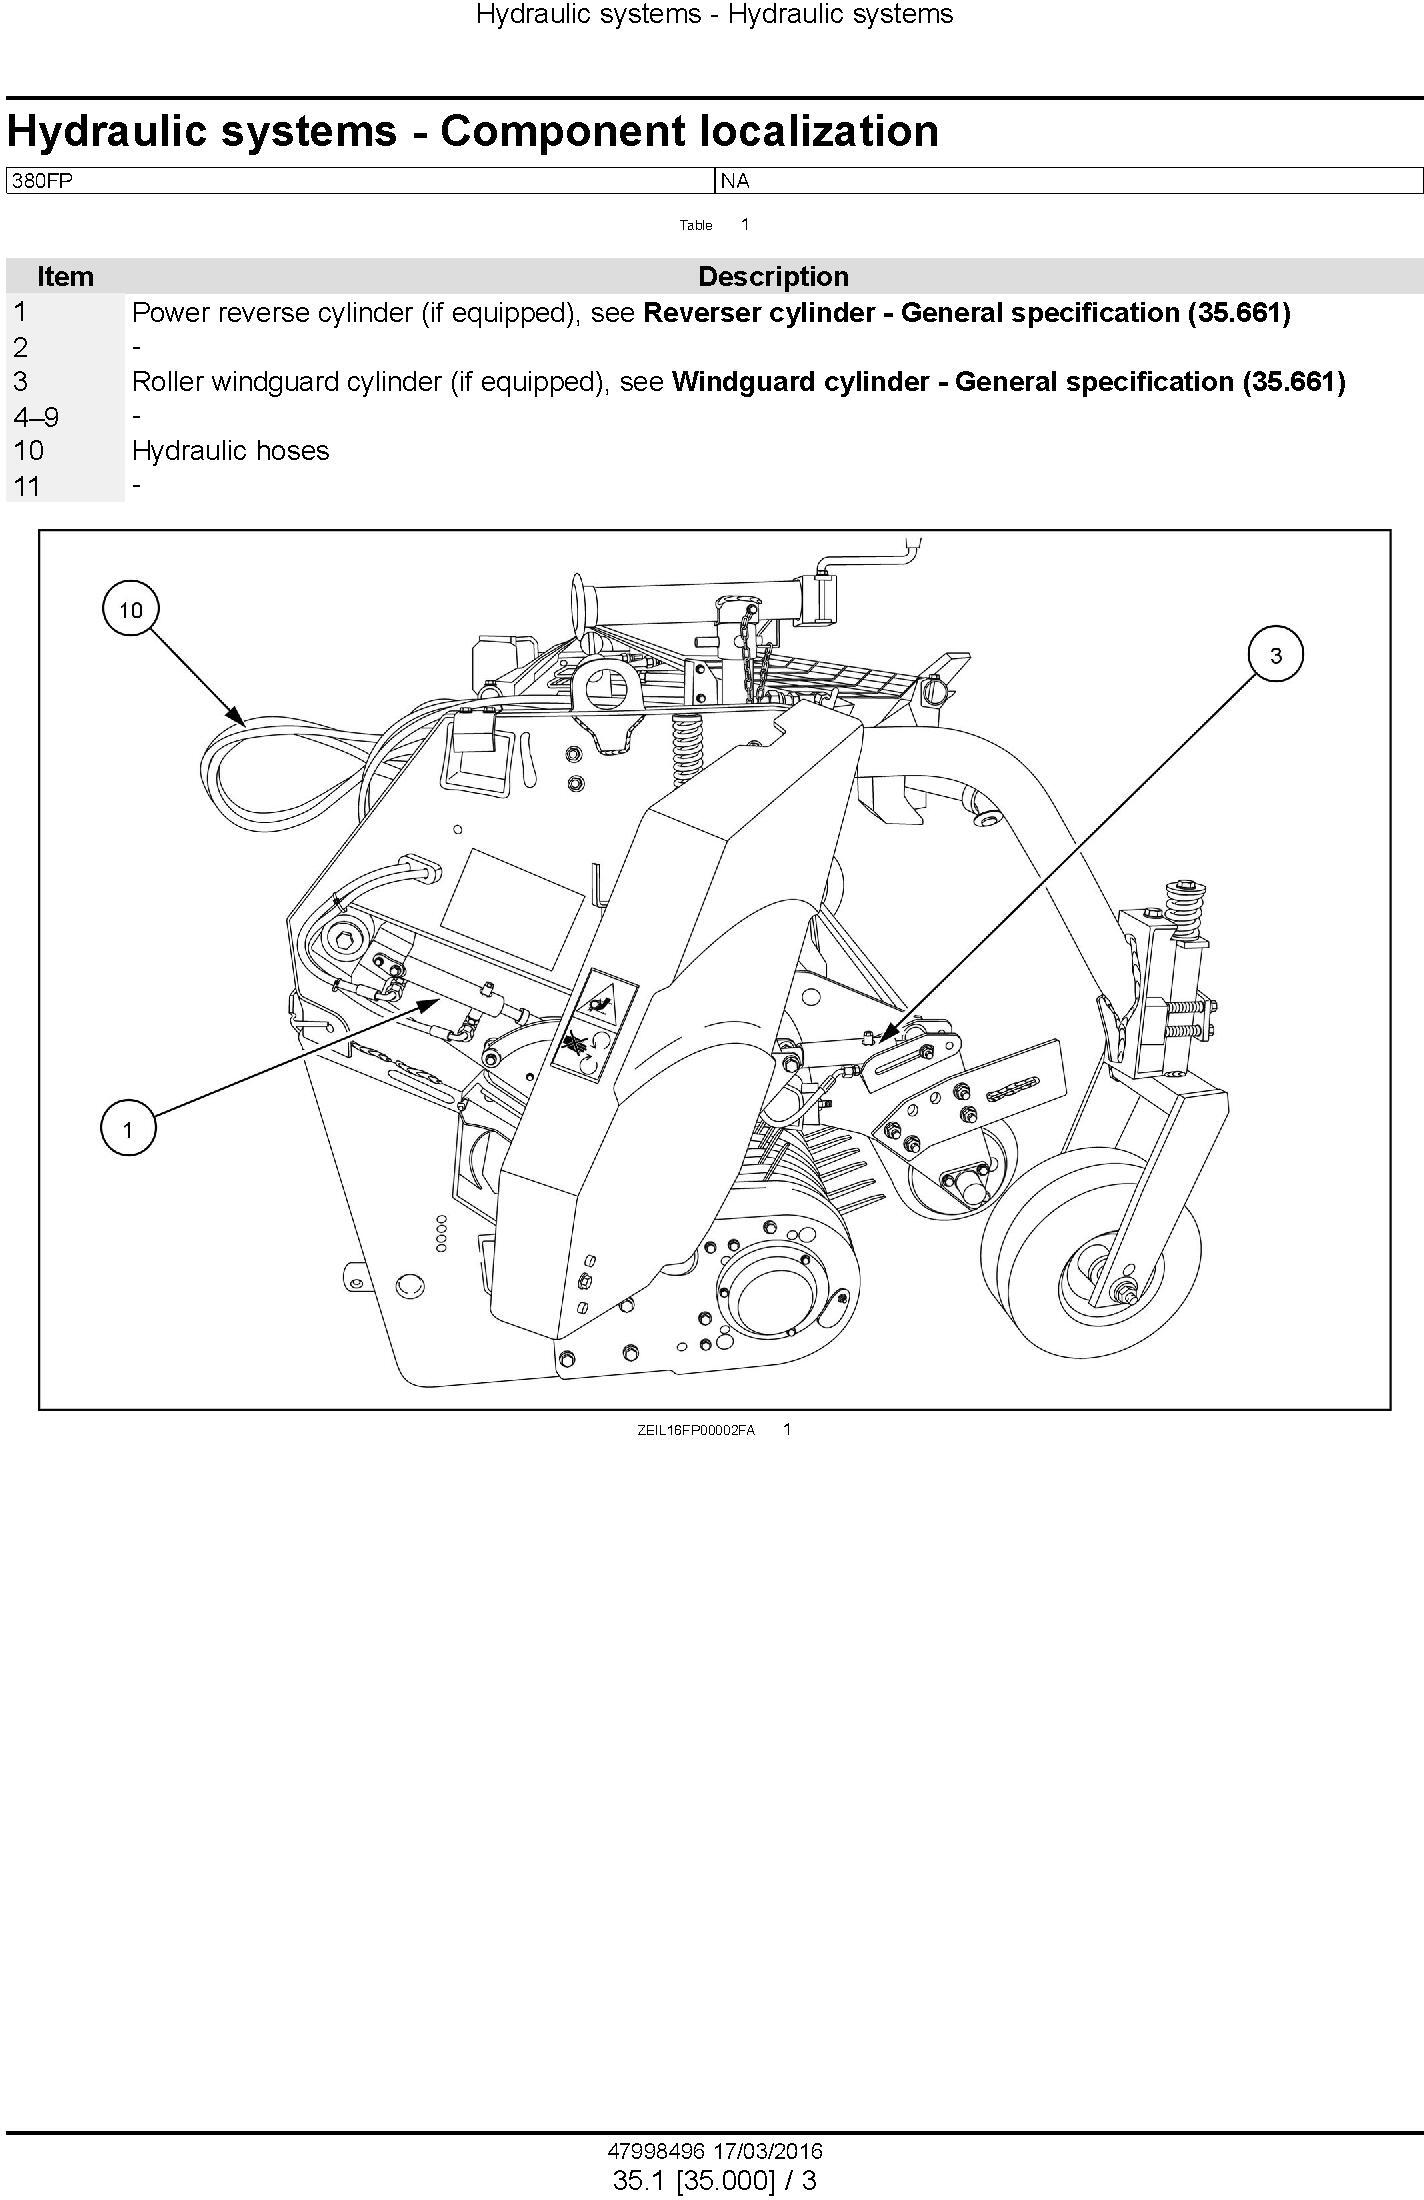 New Holland 380FP Header Service Manual - 1